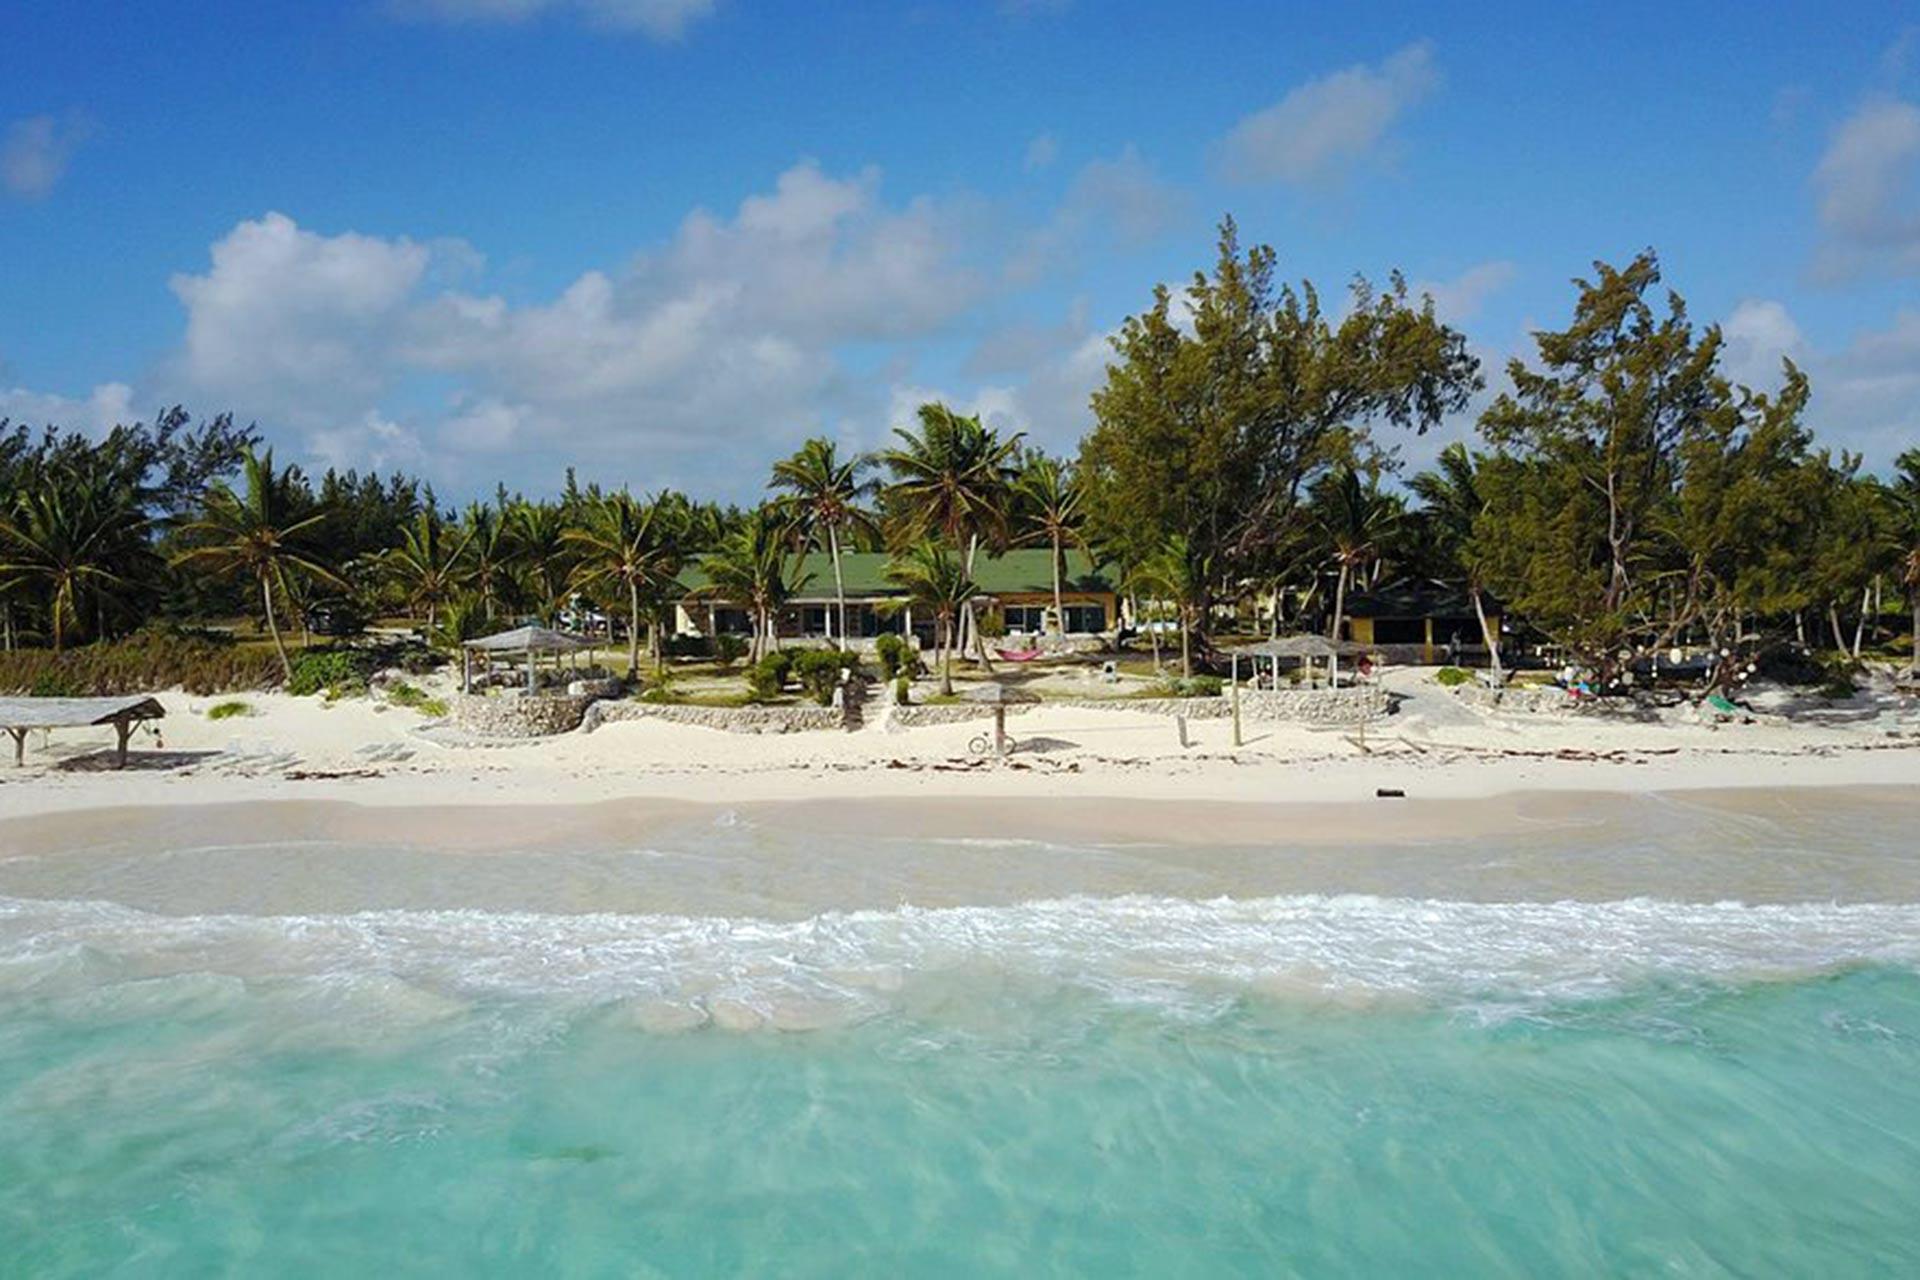 Greenwood Beach Resort in the Bahamas; Photo Courtesy of Greenwood Beach Resort